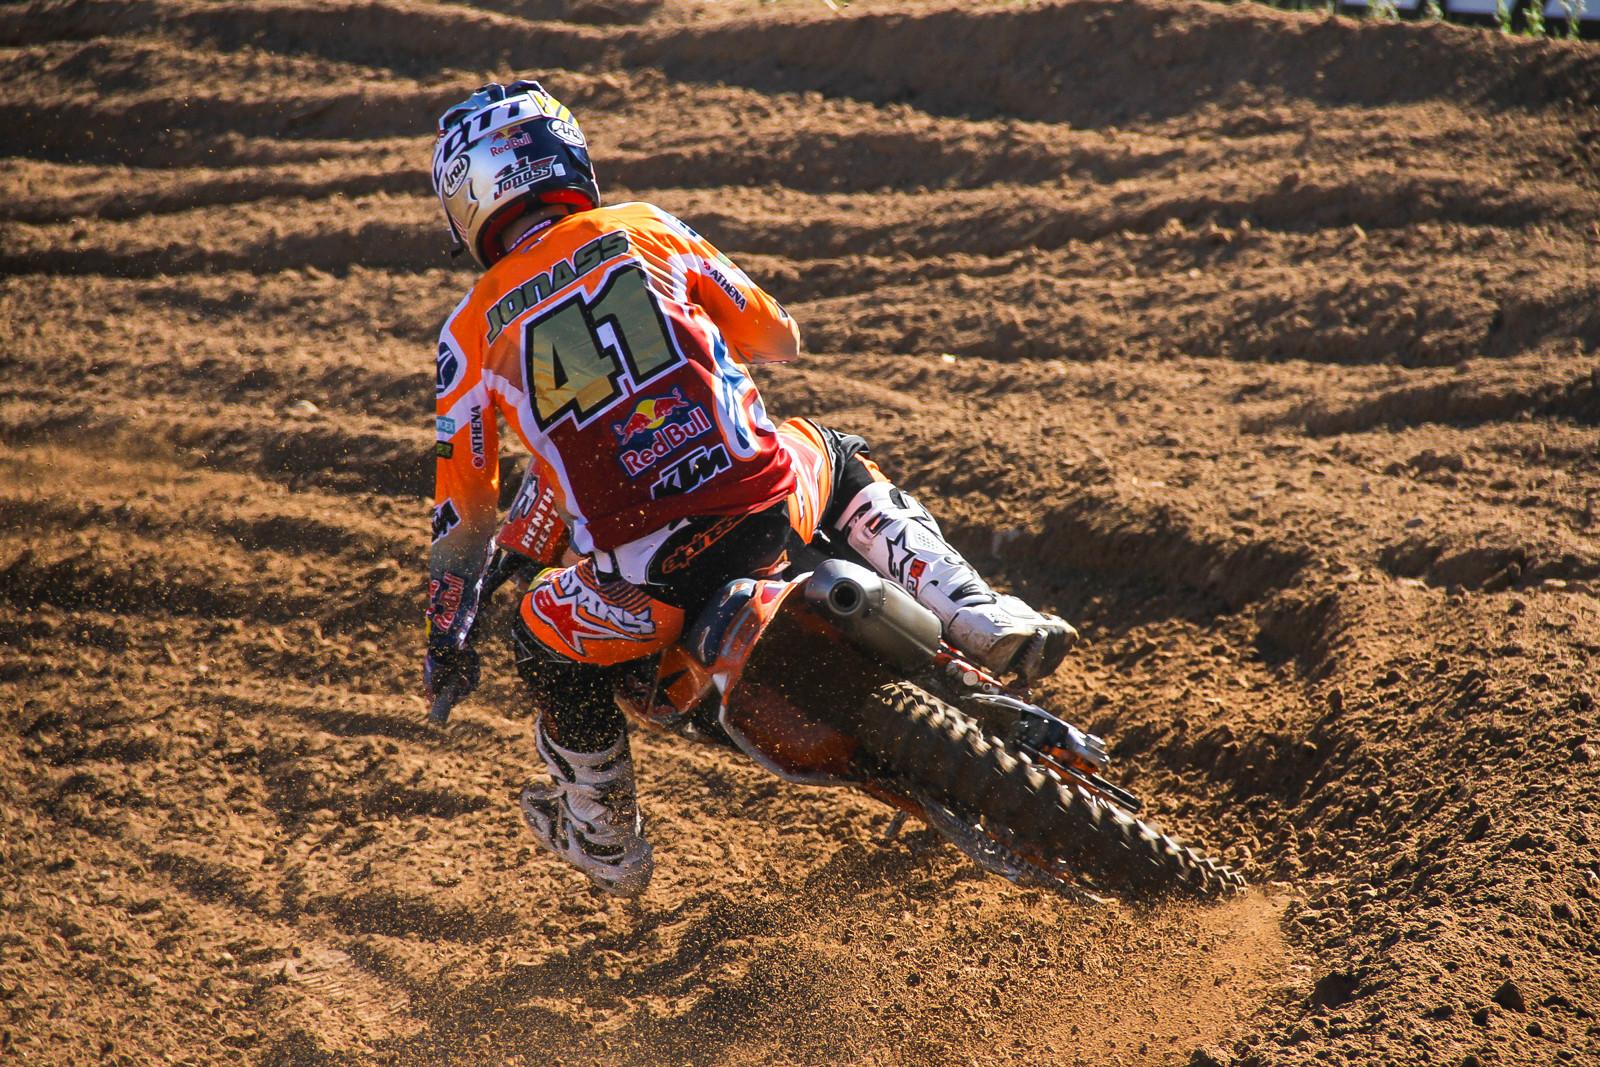 Pauls Jonass - Photo Blast: 2017 MXGP of Latvia - Motocross Pictures - Vital MX